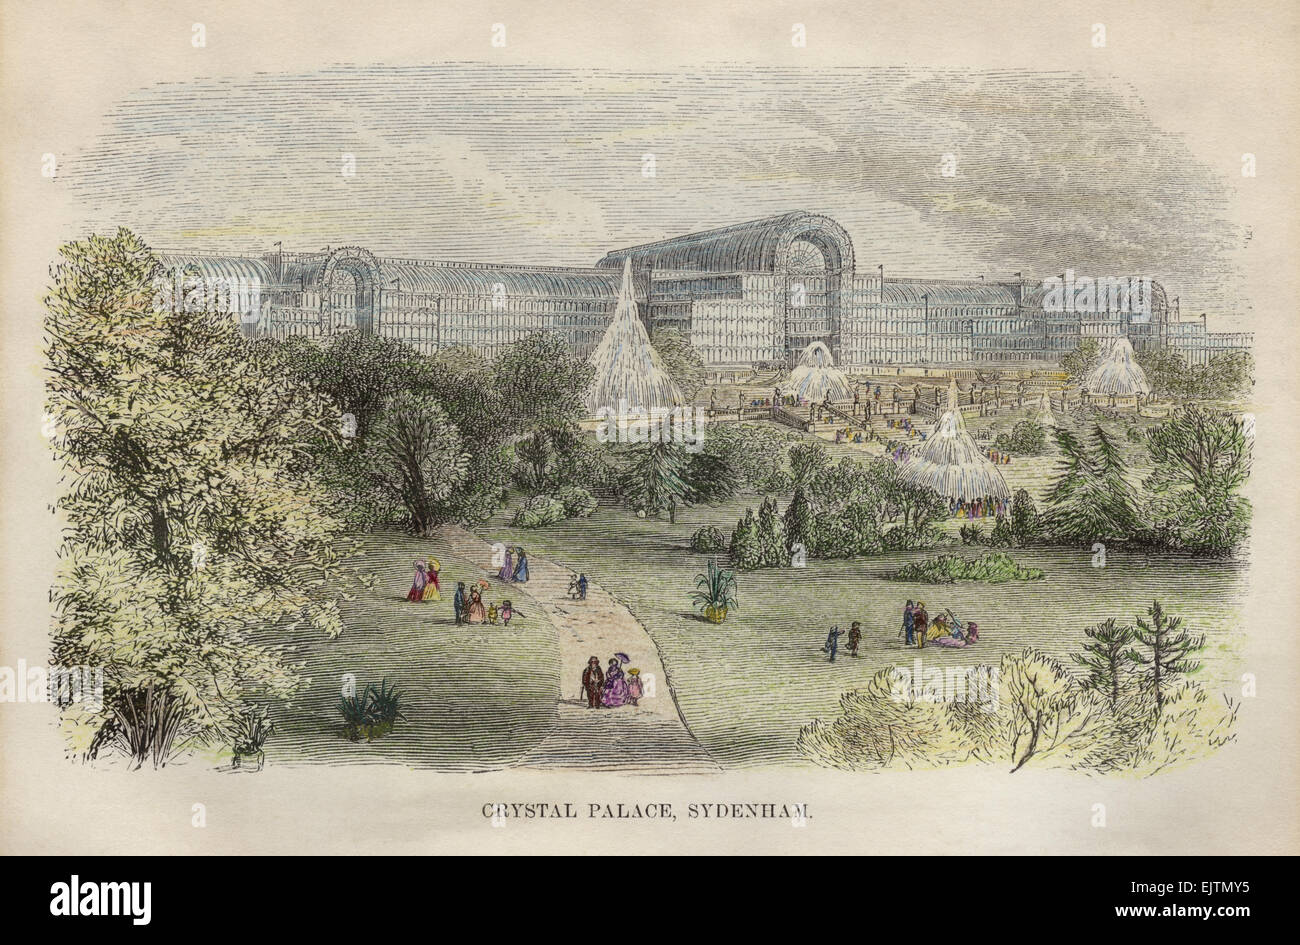 Hand tinted engraved print of the new Crystal Palace, Sydenham UK circa 1854 - Stock Image